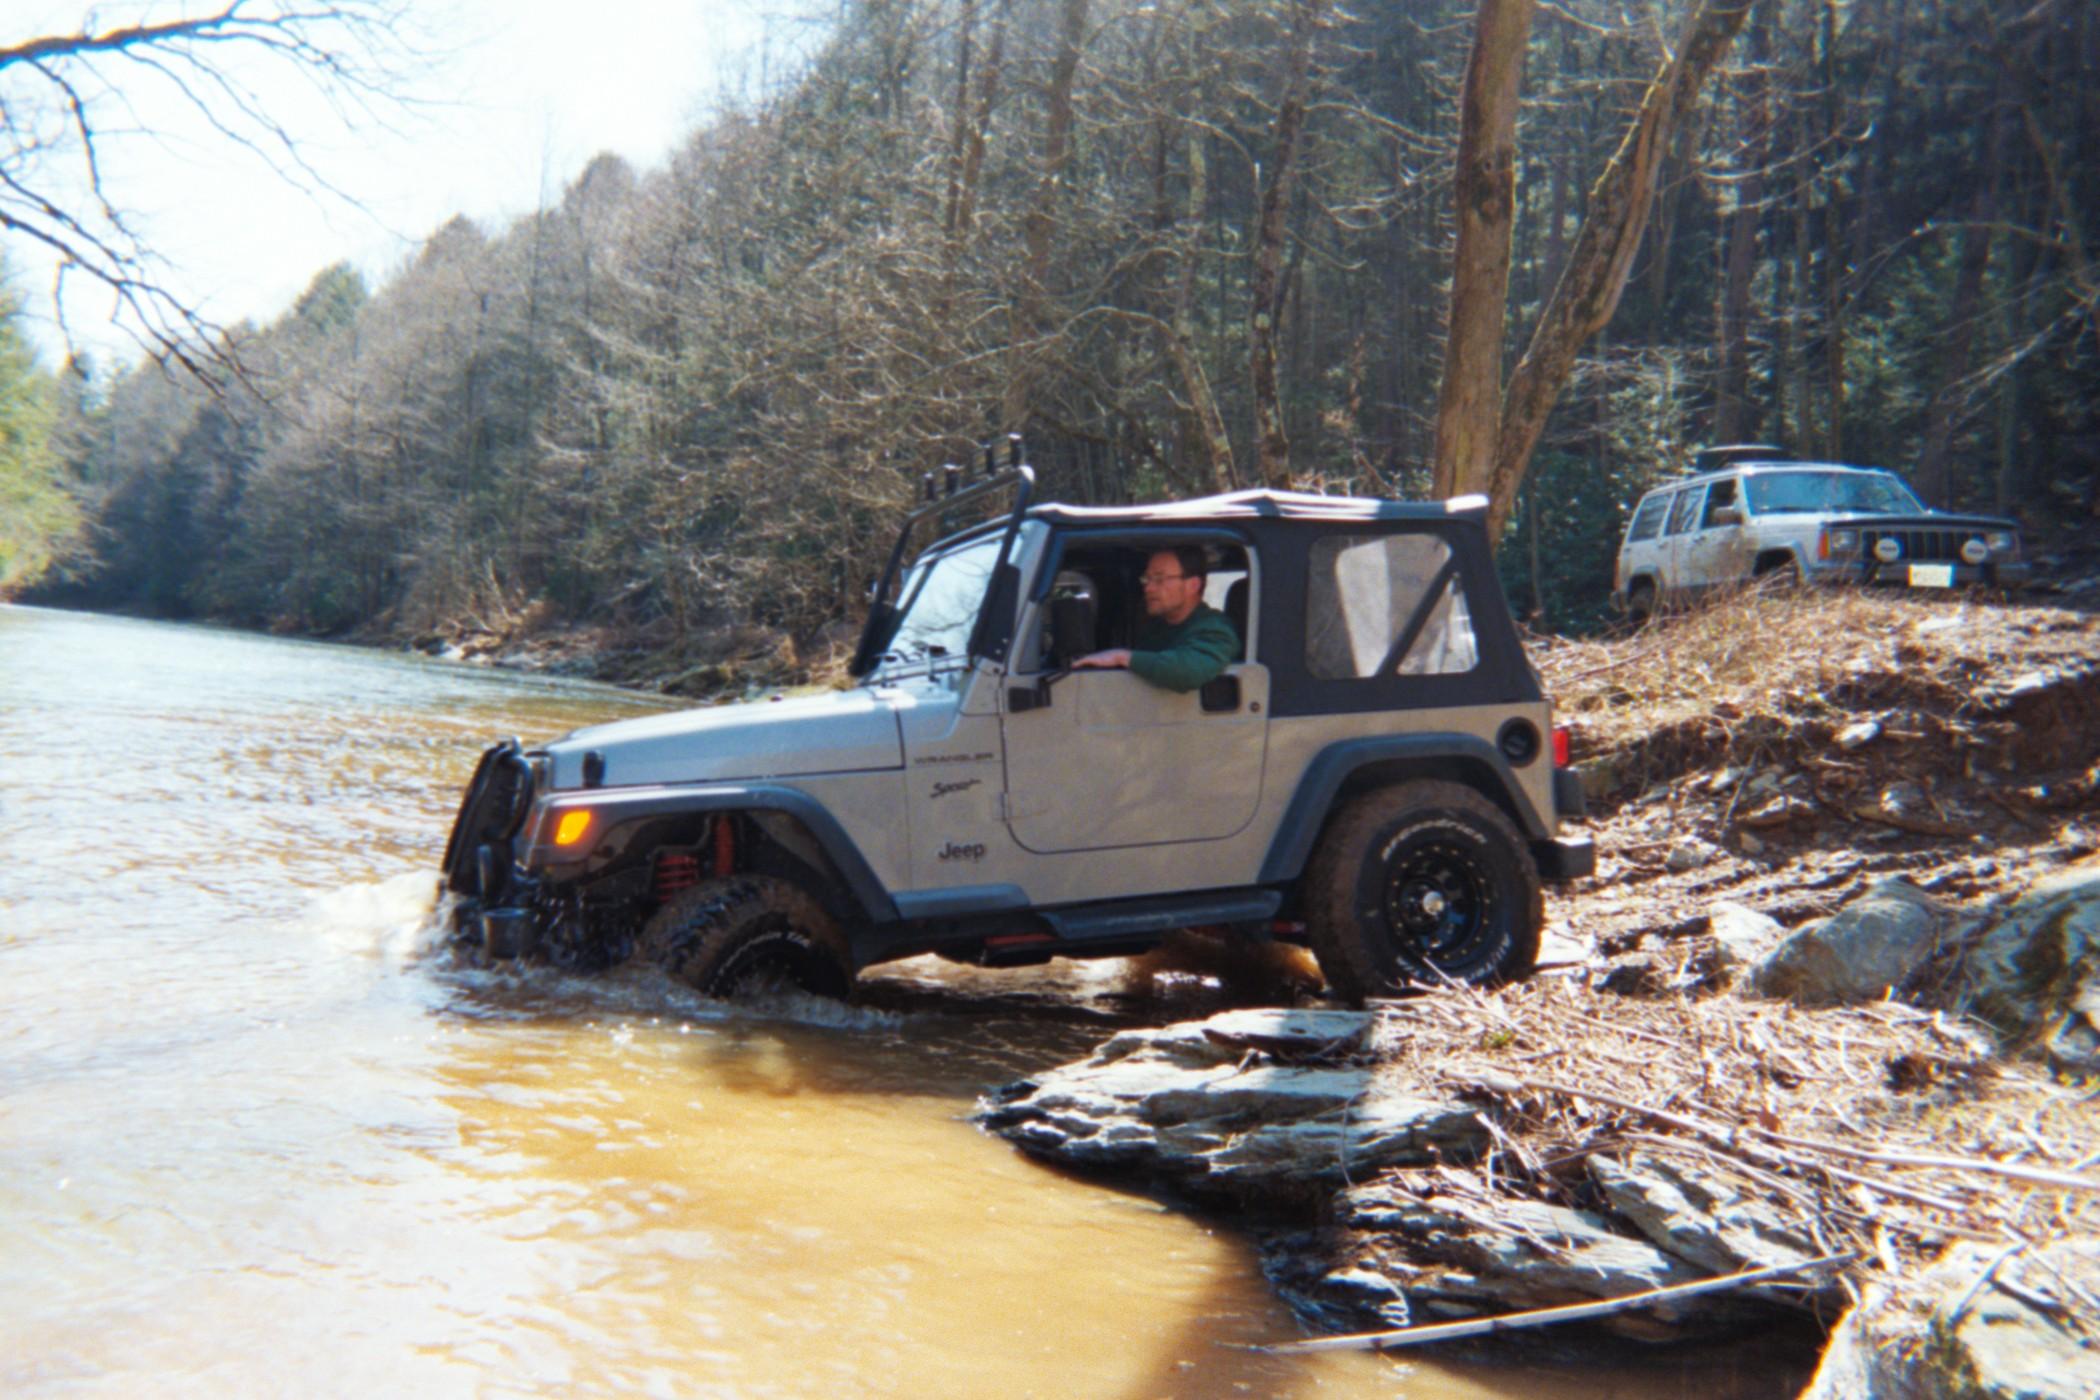 2002 Jeep Wrangler Image 6